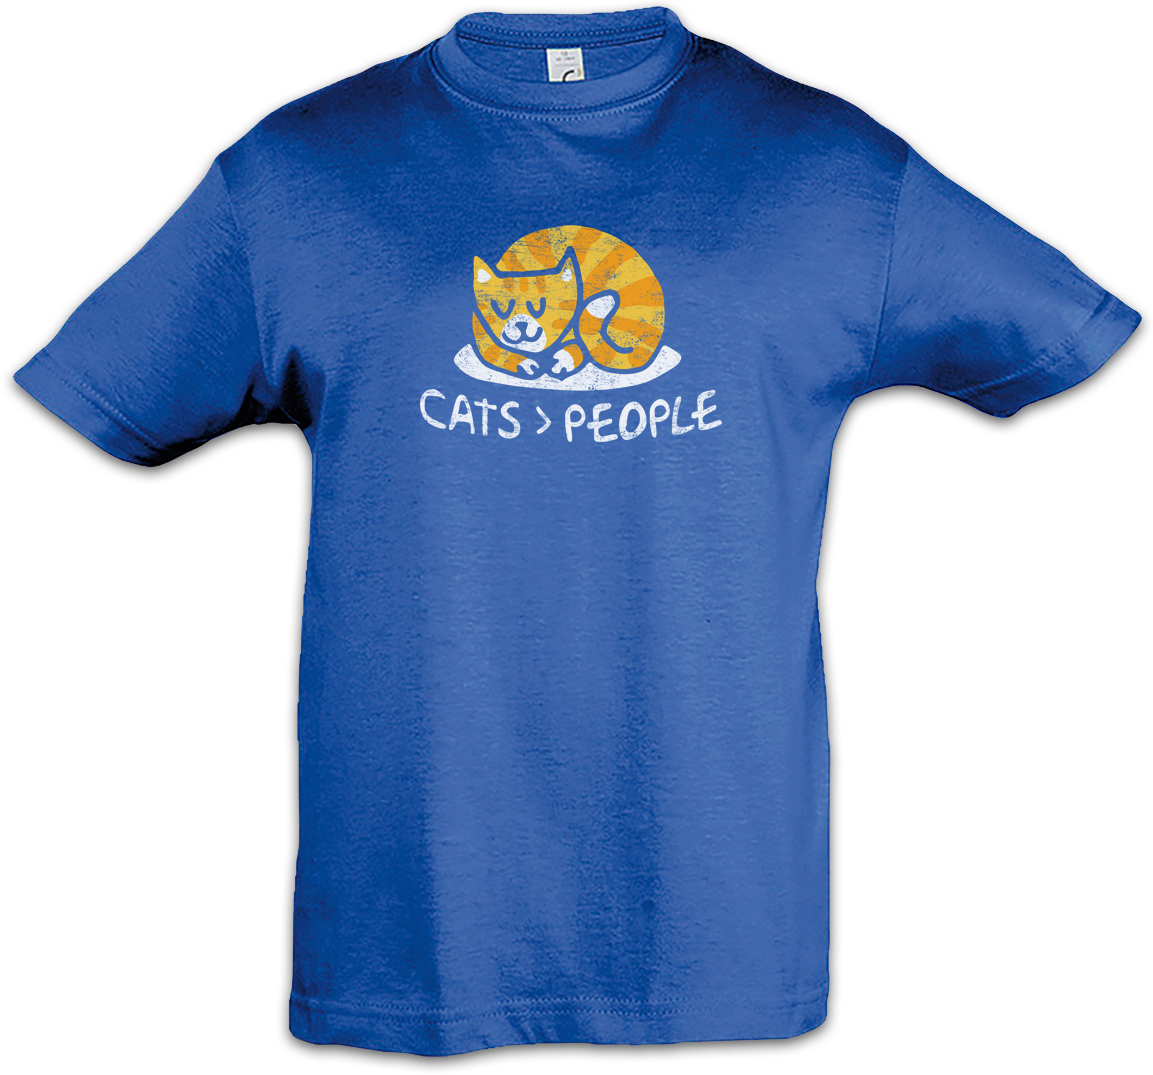 Dragon Cat Love T-Shirt Cats Cartoon Comic Toon Addicted Addiction Fun